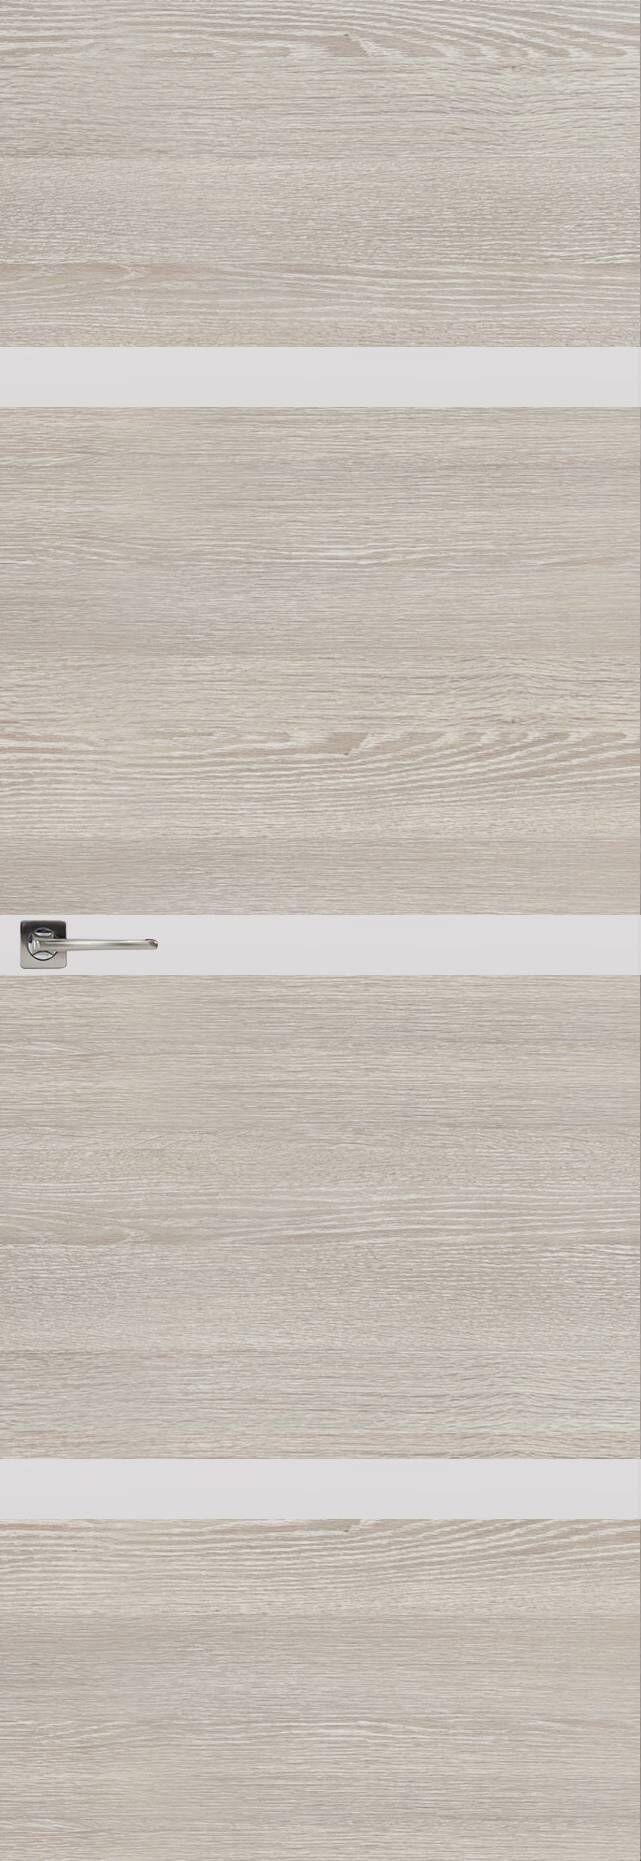 Tivoli Г-4 Invisible цвет - Серый дуб Без стекла (ДГ)